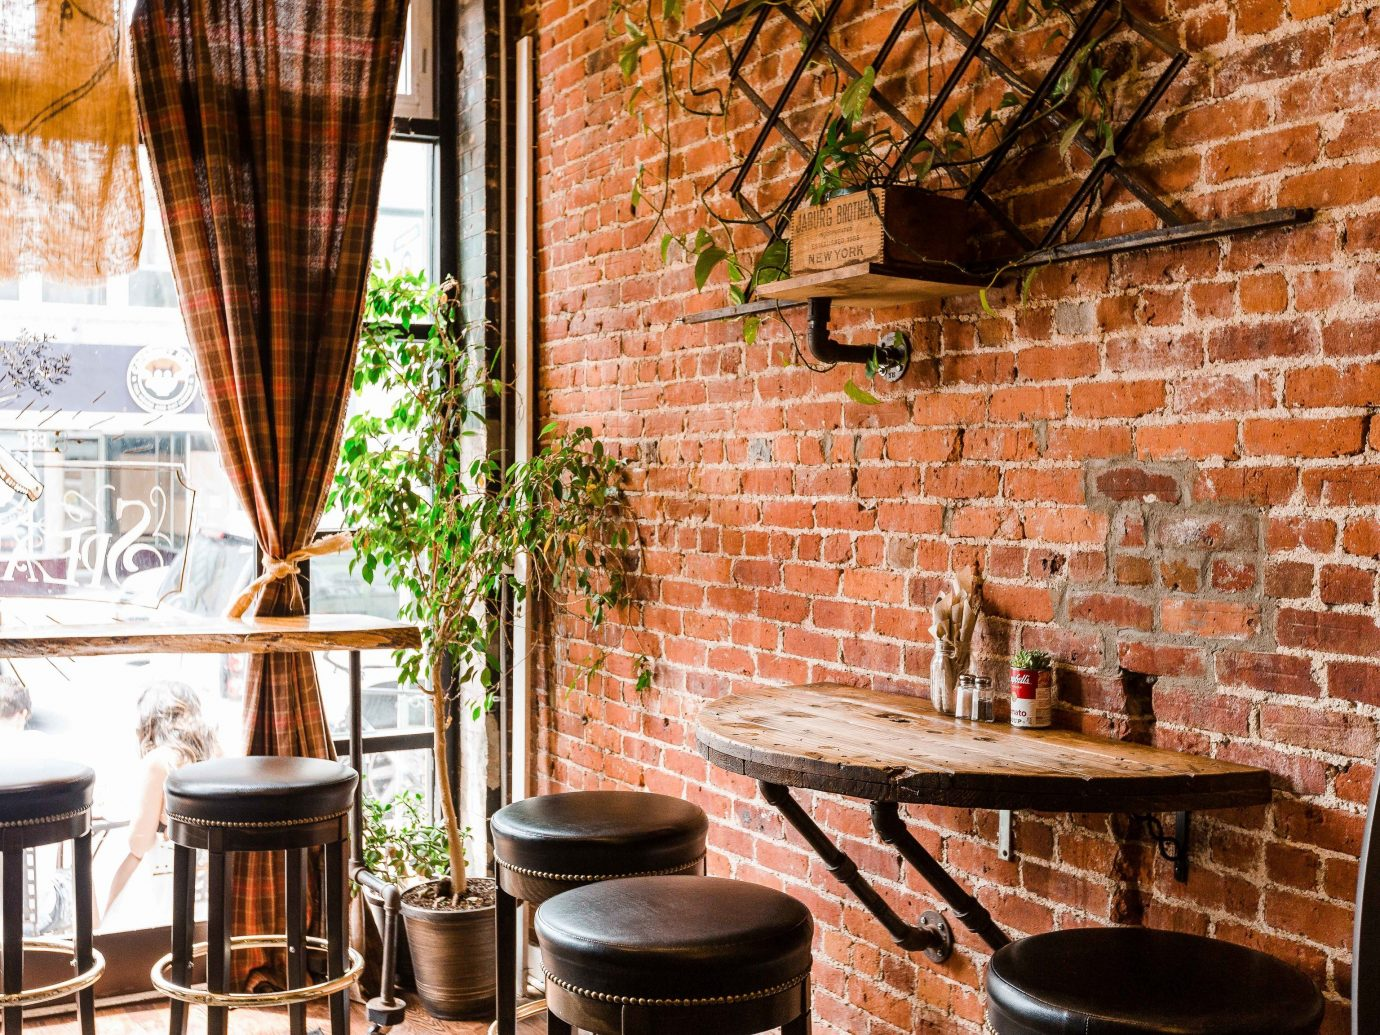 Trip Ideas chair brick wall interior design home window café restaurant brickwork furniture